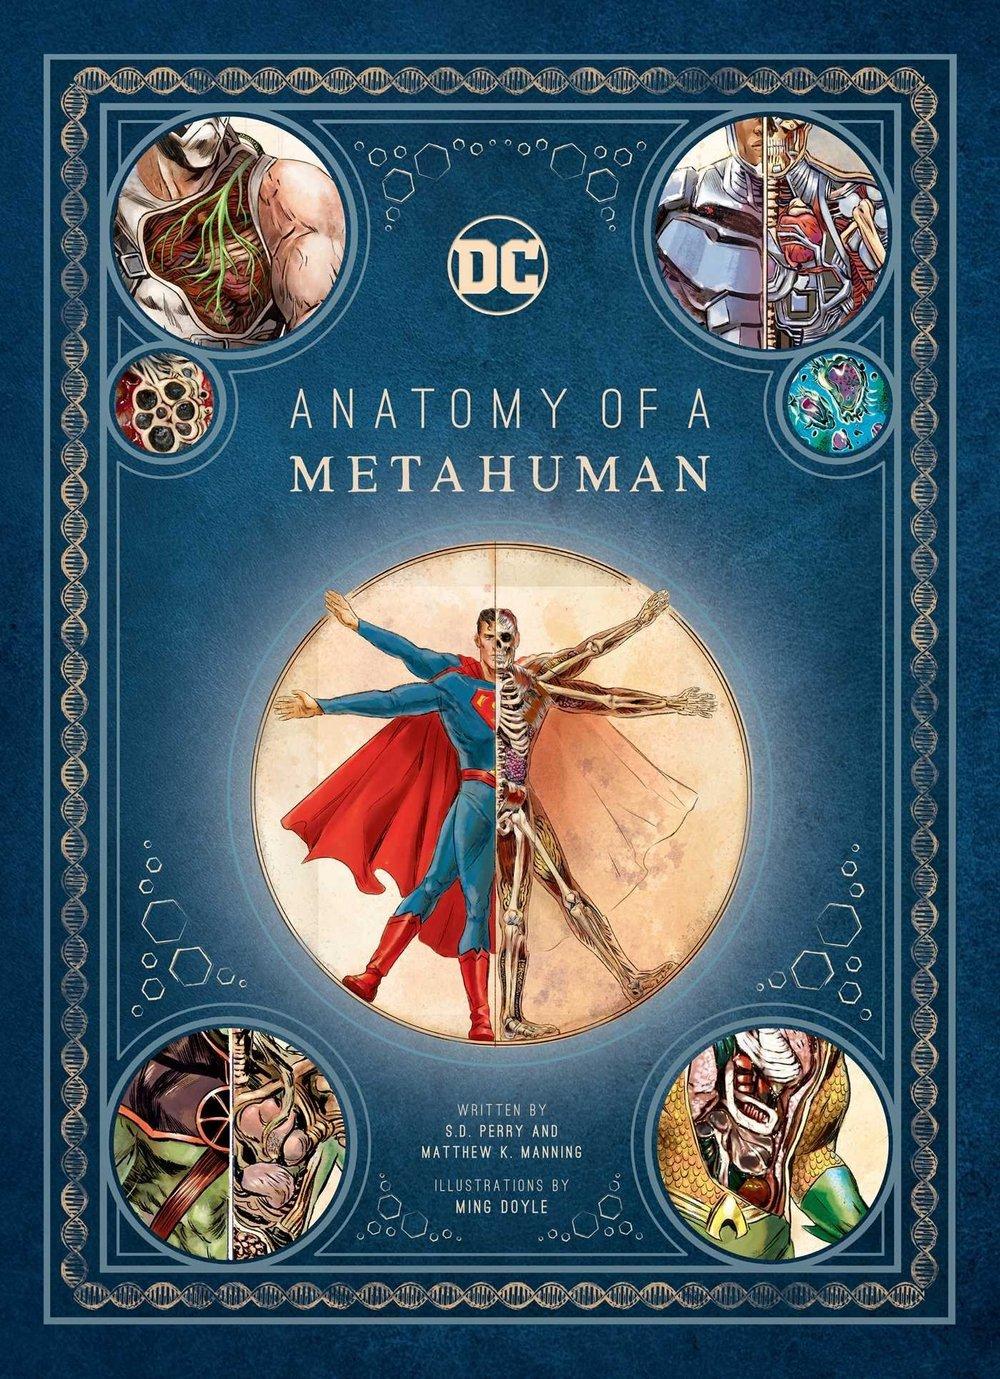 DOYLE_Anatomy-Metahuman-Cvr.jpg